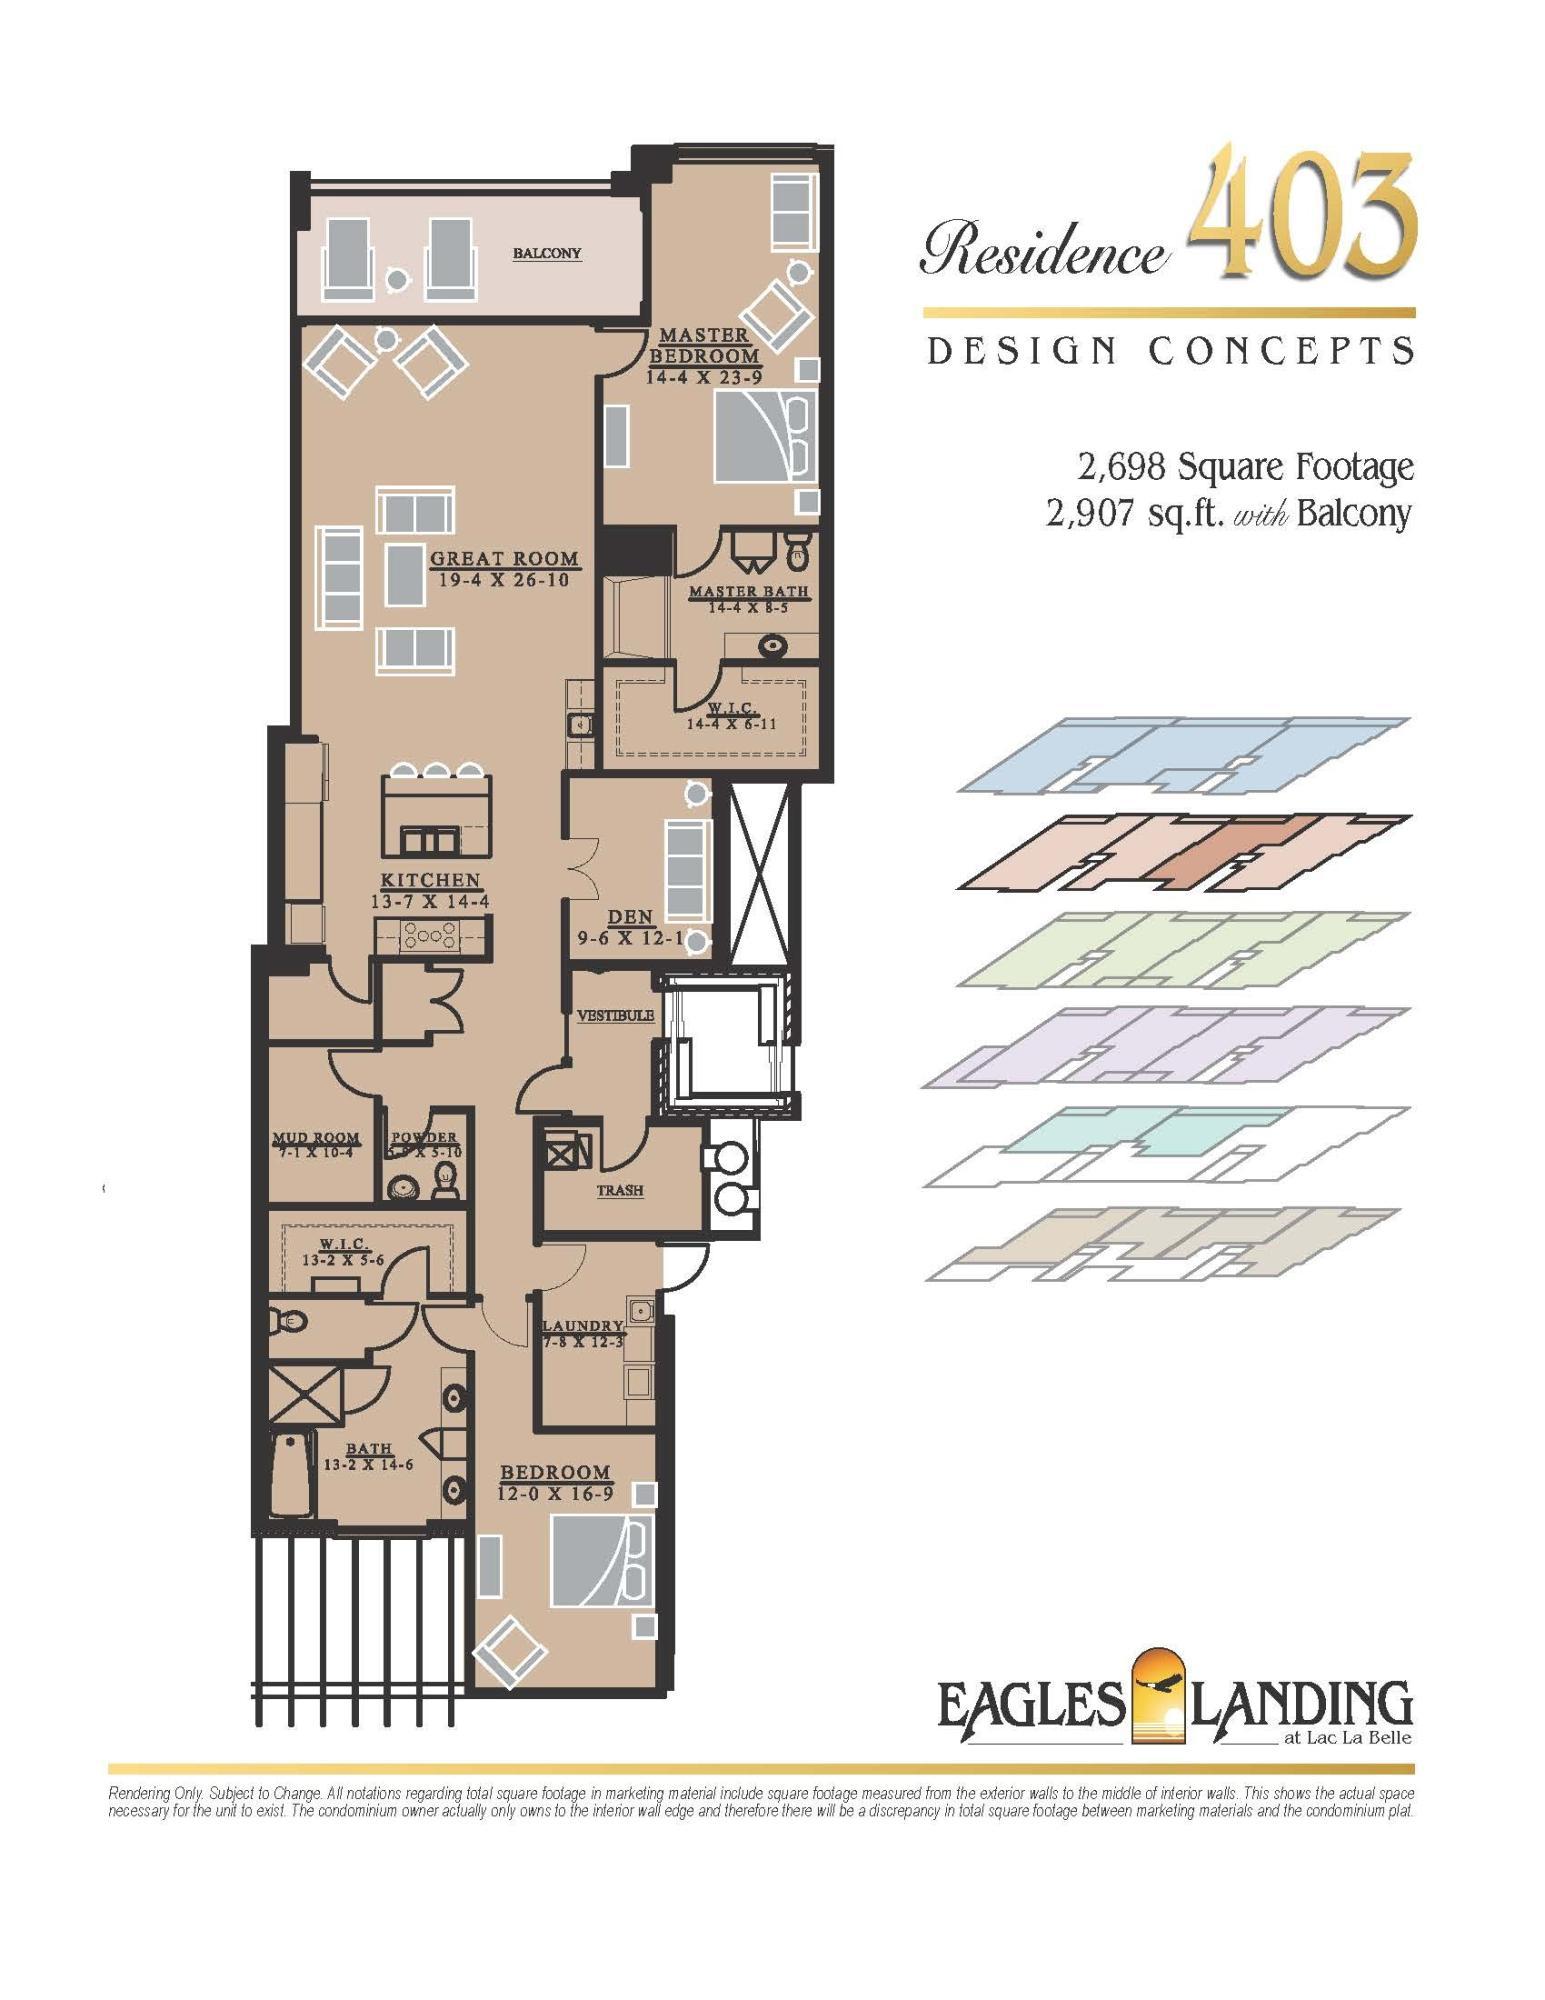 128 Wisconsin Ave, Oconomowoc, Wisconsin 53066, 2 Bedrooms Bedrooms, 8 Rooms Rooms,2 BathroomsBathrooms,Condominiums,For Sale,Wisconsin Ave,4,1581028